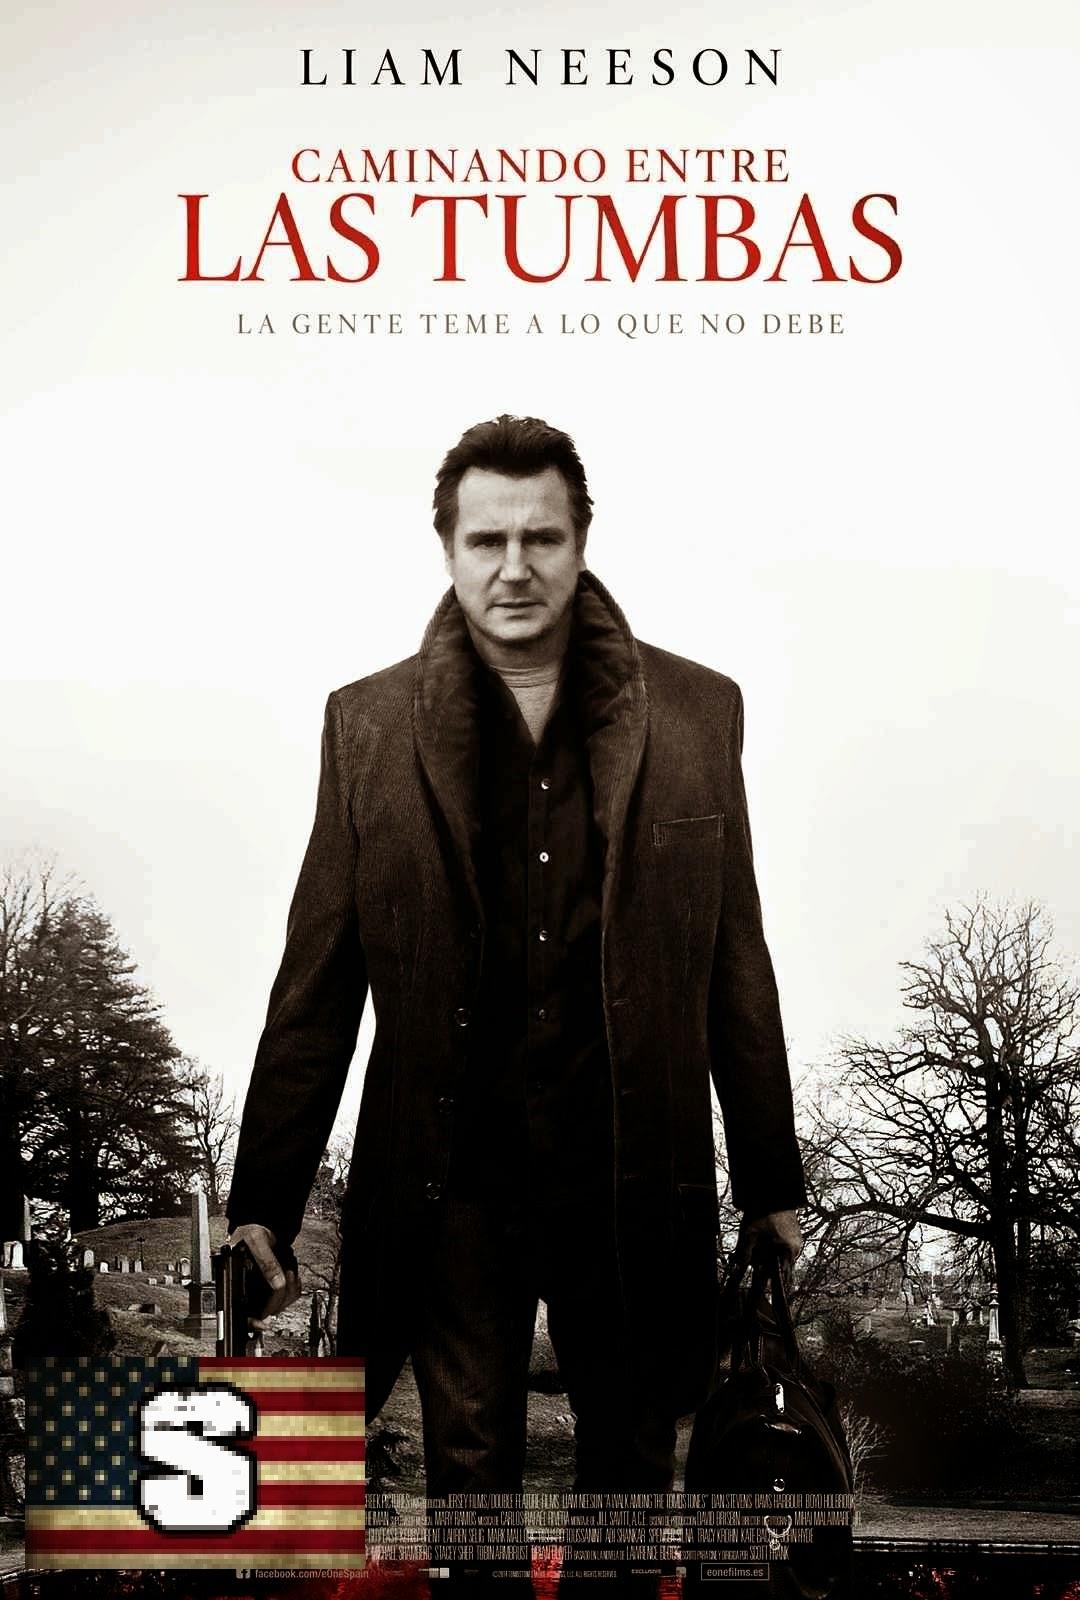 Caminando entre tumbas [Liam Neeson] [DvdRip]